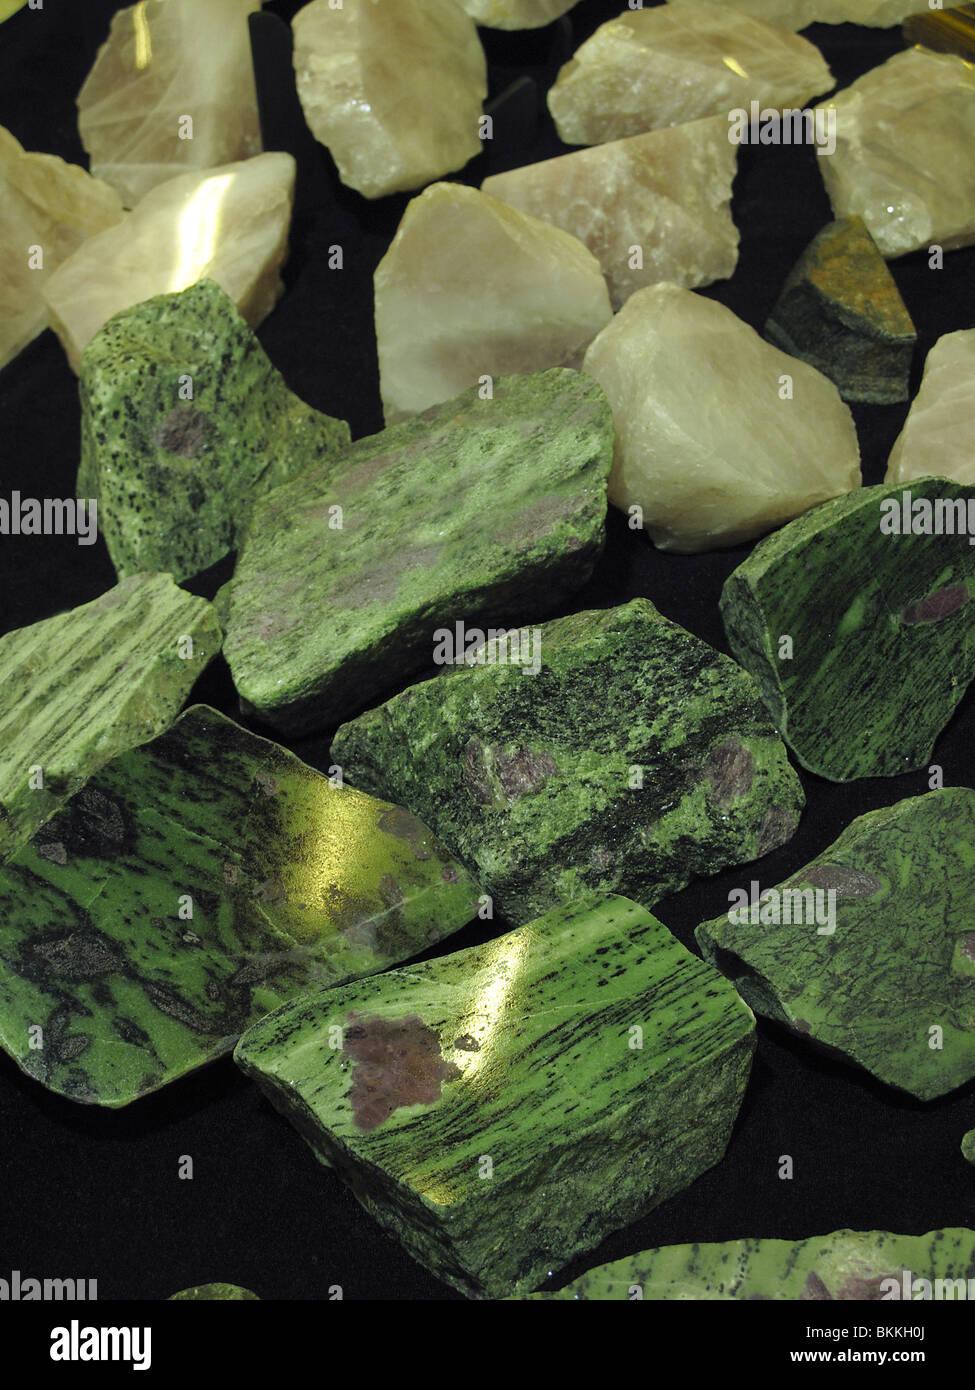 Semi Precious Gemstone Raw Stone : Collection of raw semi precious stones anyolite or